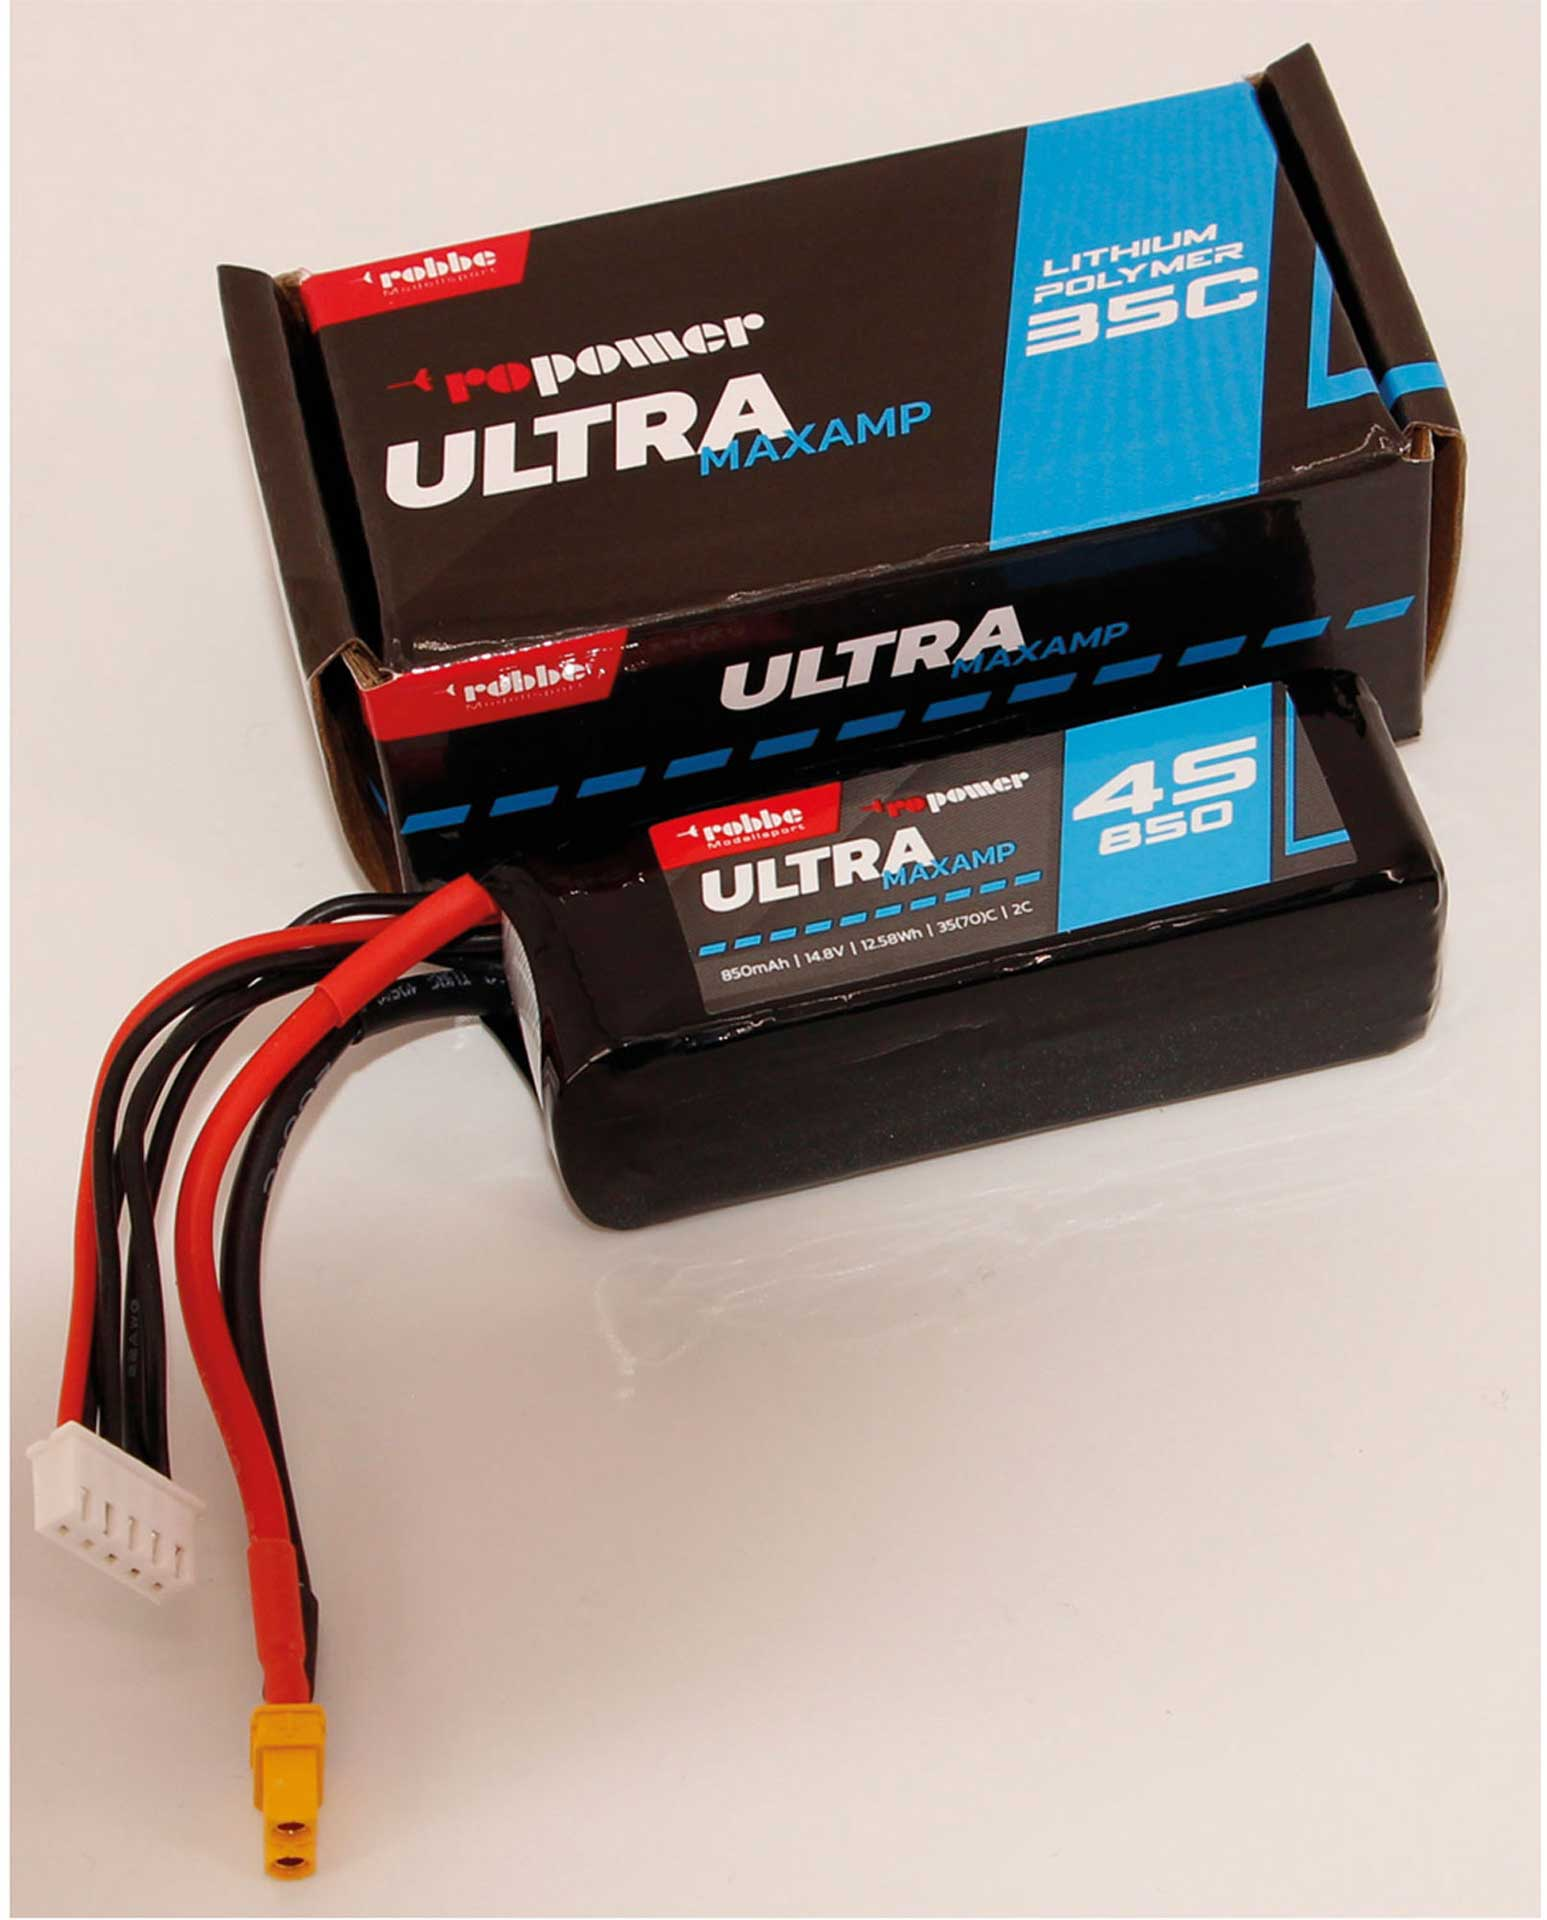 Robbe Modellsport RO-POWER ULTRA MAXAMP 850MAH 14,8 VOLT 4S 35(70)C LIPO AKKU